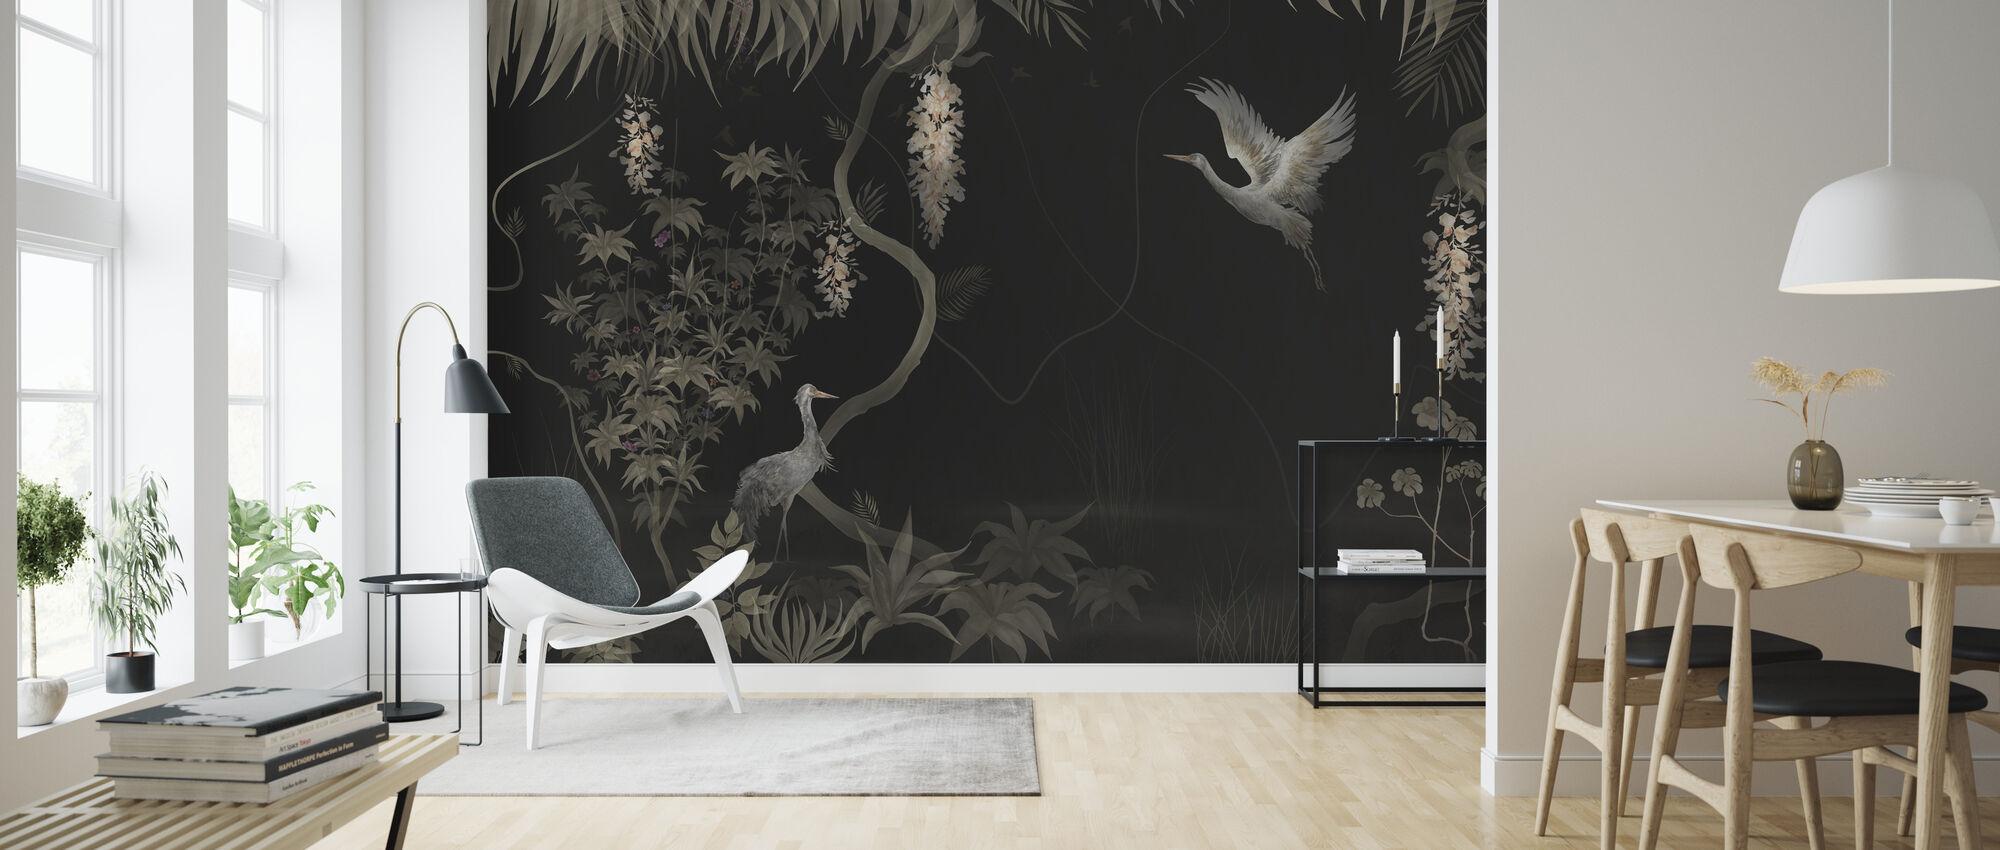 Tranquil Scenery - Dark Sepia - Wallpaper - Living Room